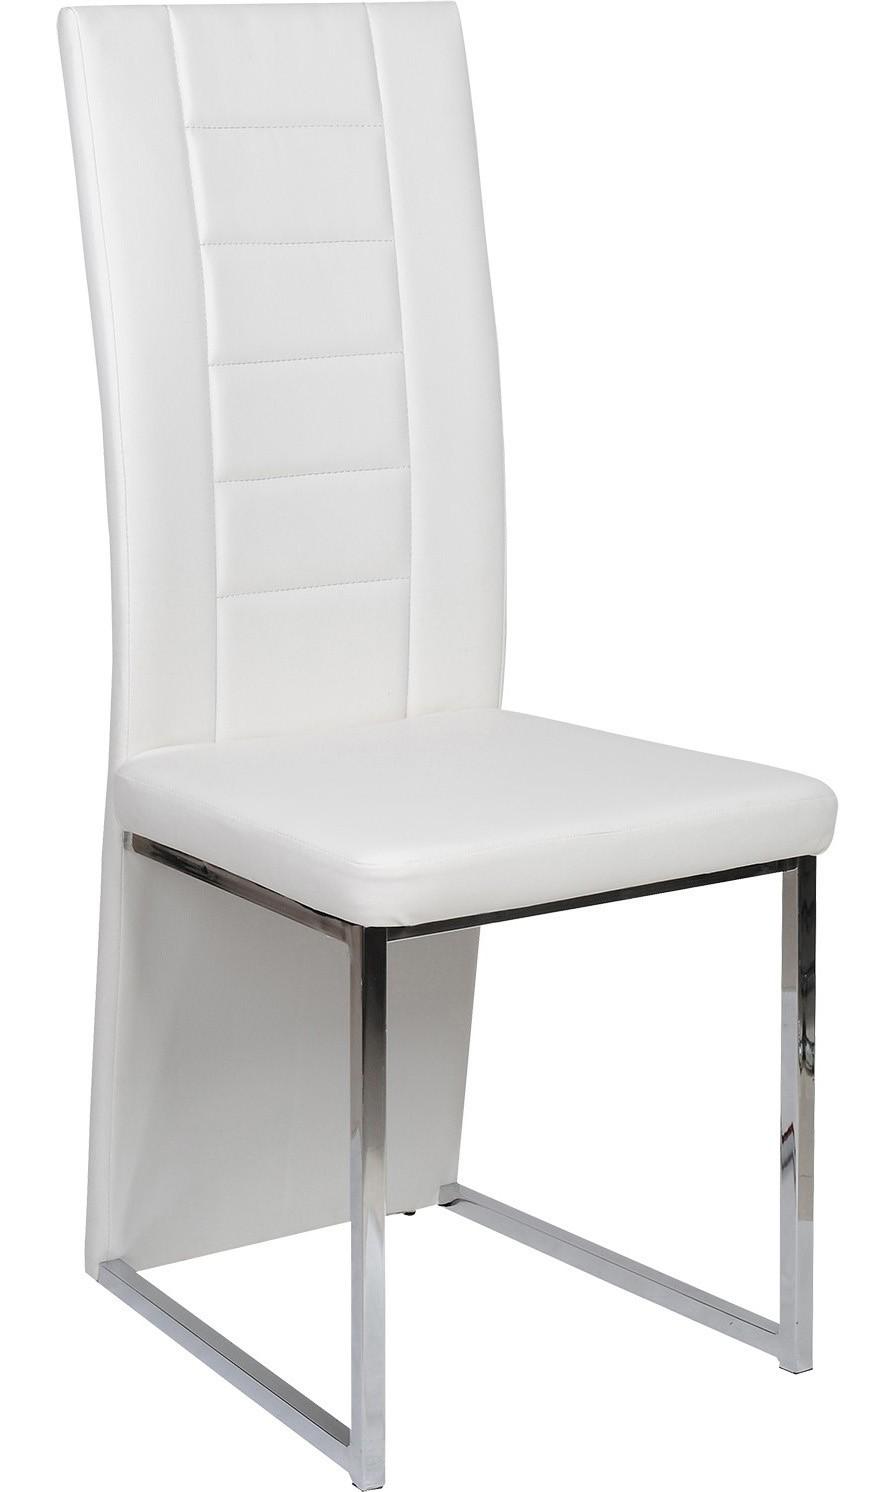 Chaise capitonn e blanche tyko for Chaise hauteur assise 48